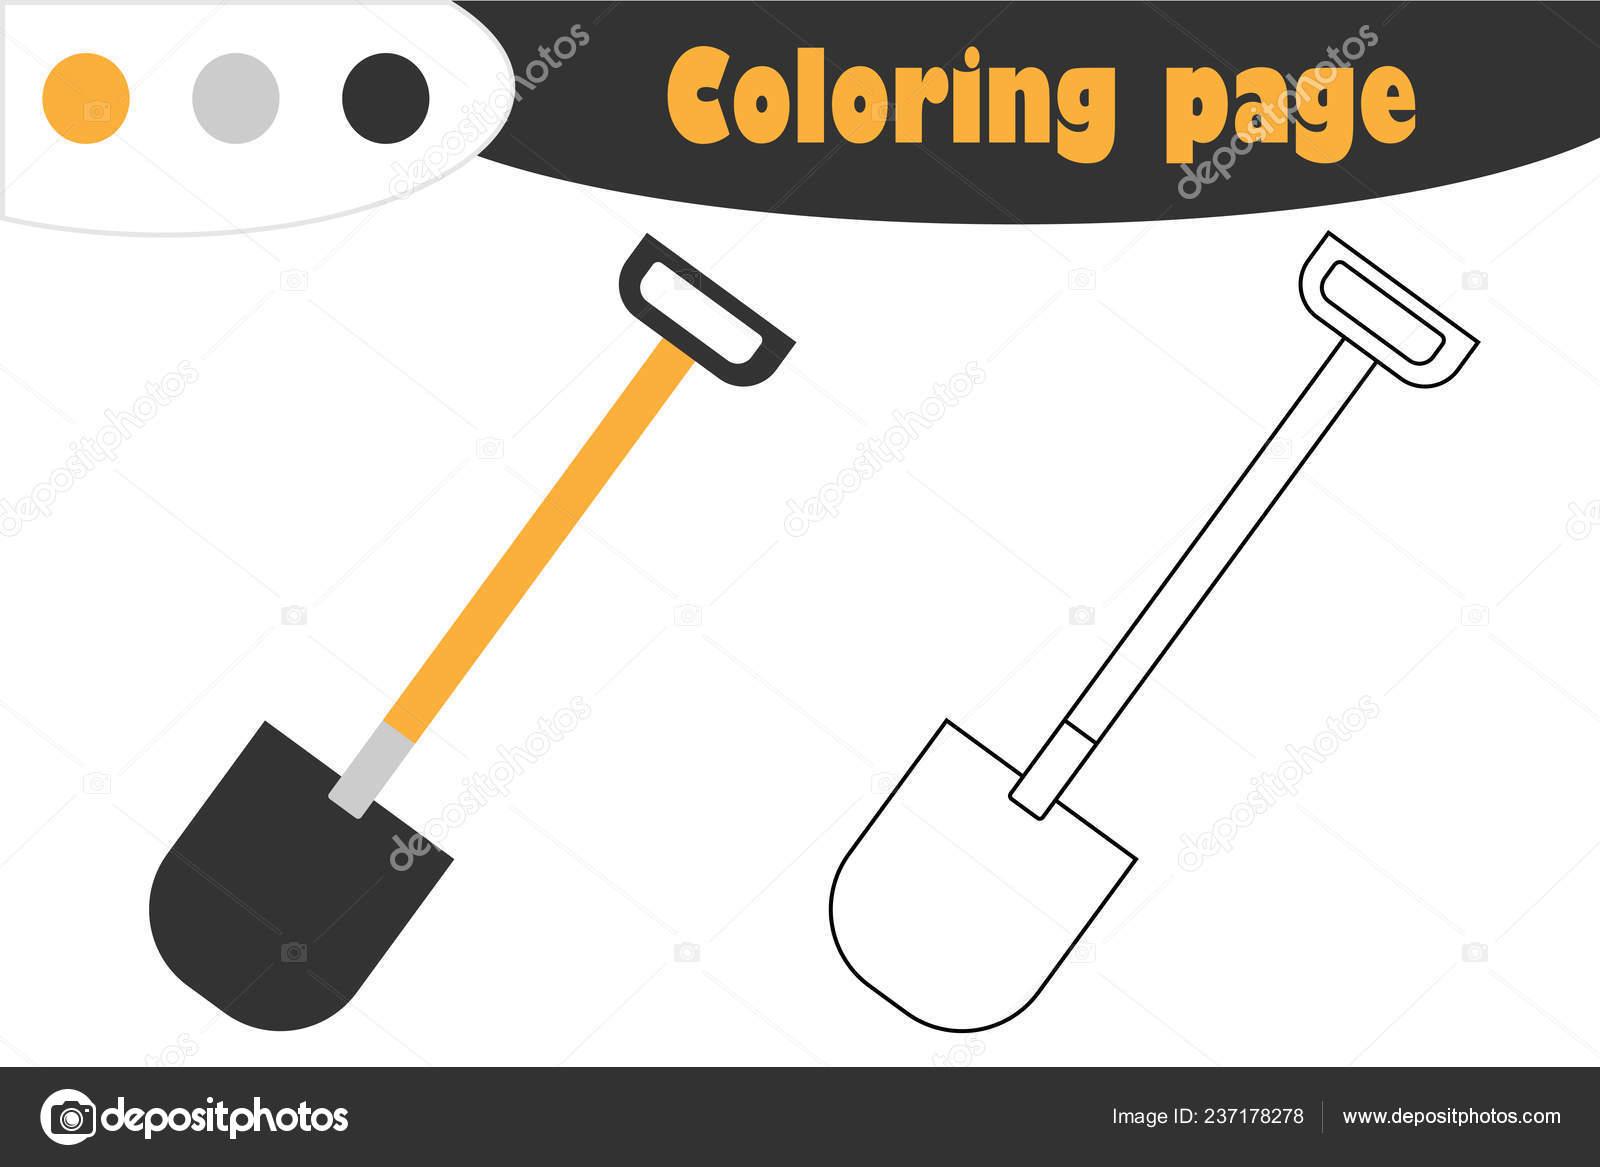 depositphotos stock illustration shovel in cartoon style coloring